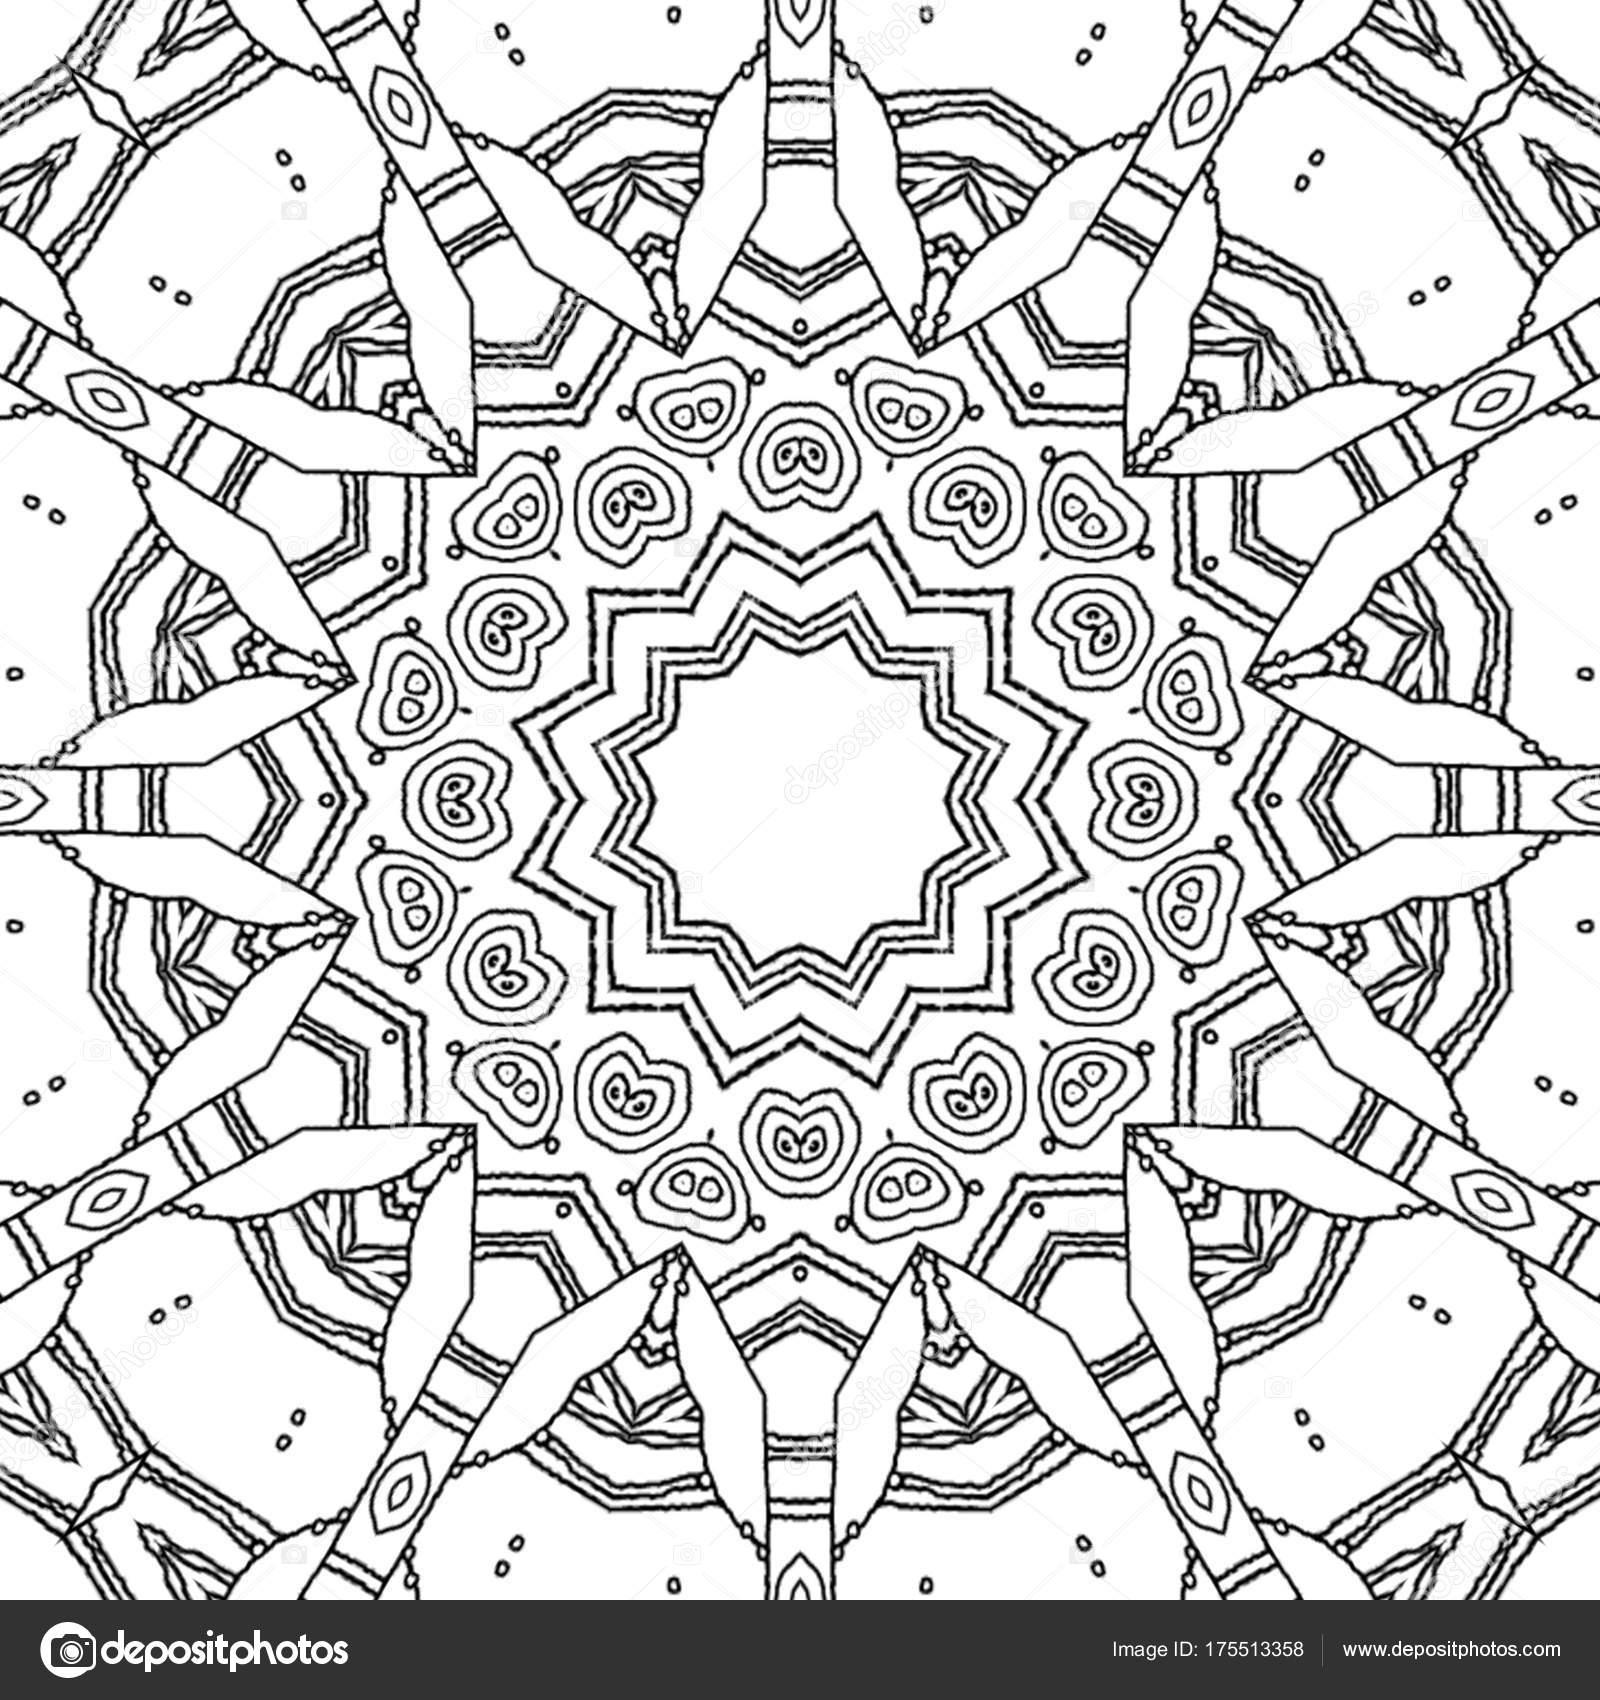 Kleurplaten Ster Mandala.Abstract Kleurplaat Pagina Tekenen Monochroom Mandala Met Ster